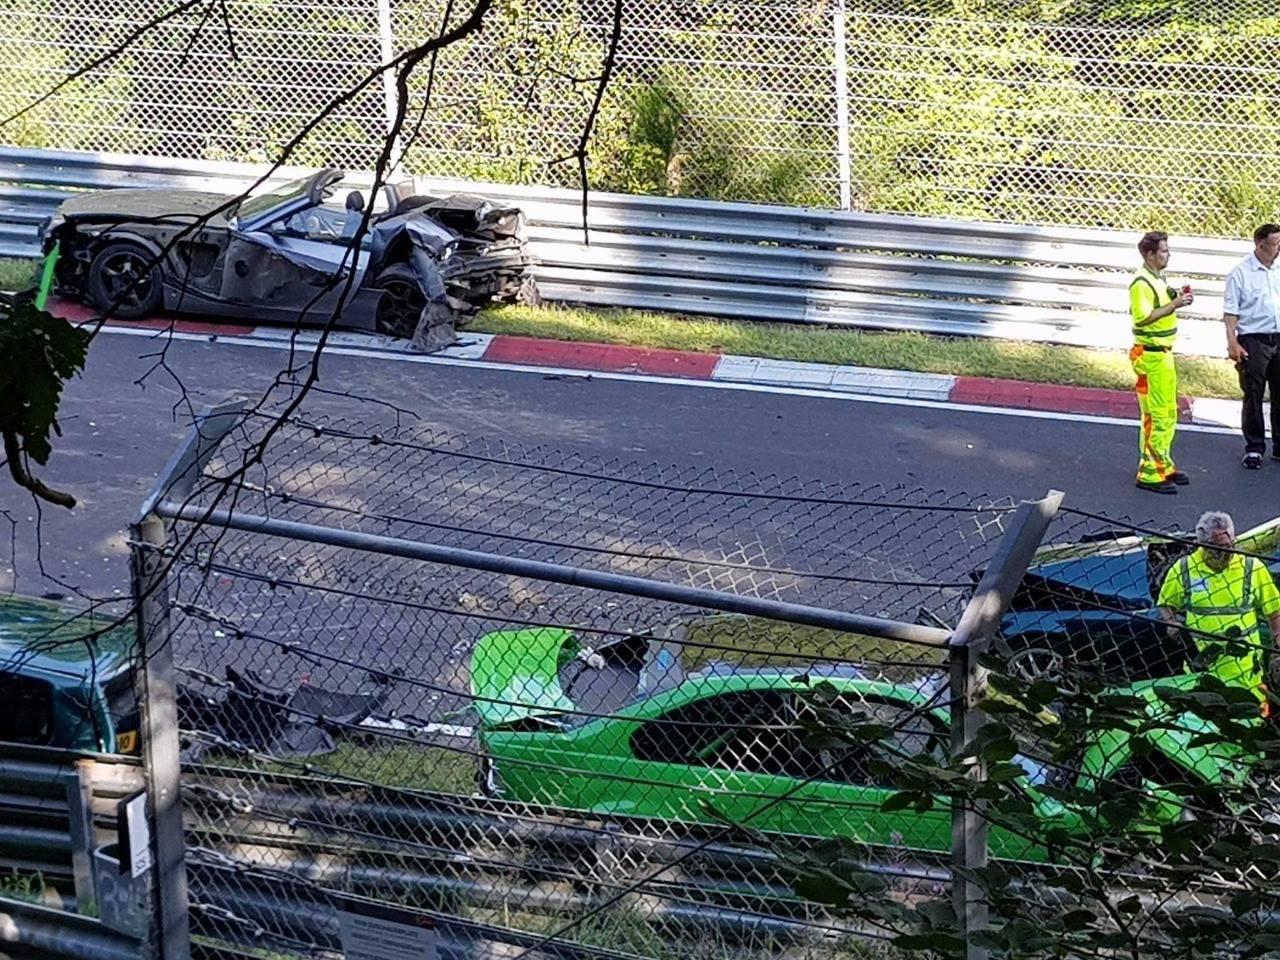 Nurburgring crash august 2017 (10)